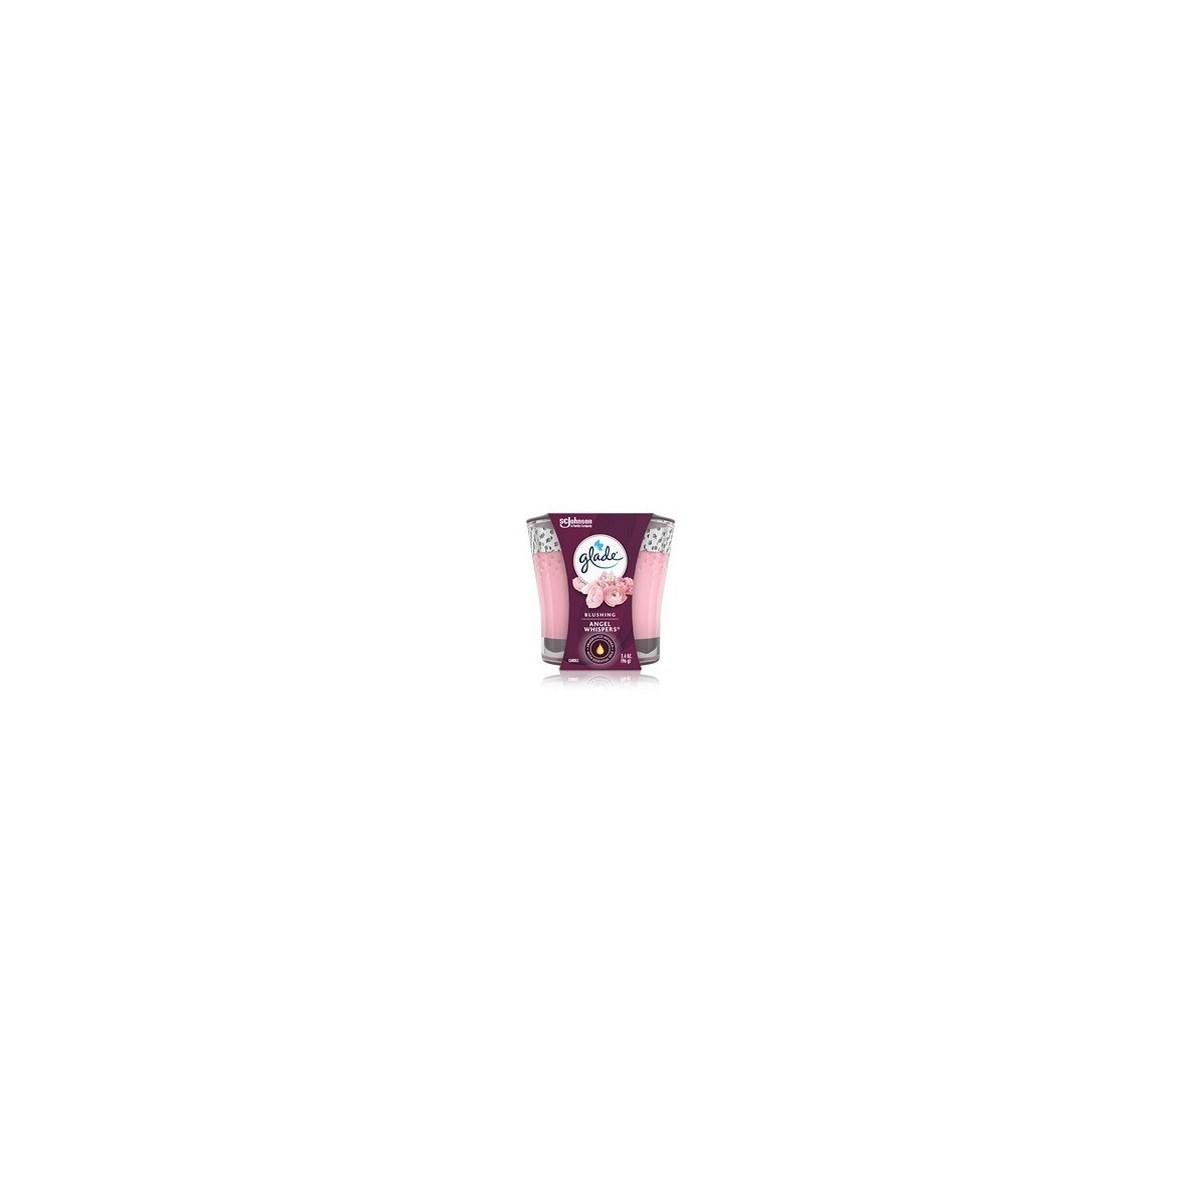 GLADE SCENTED CANDLES ANGEL WISPER 6/3.4OZ(76950)